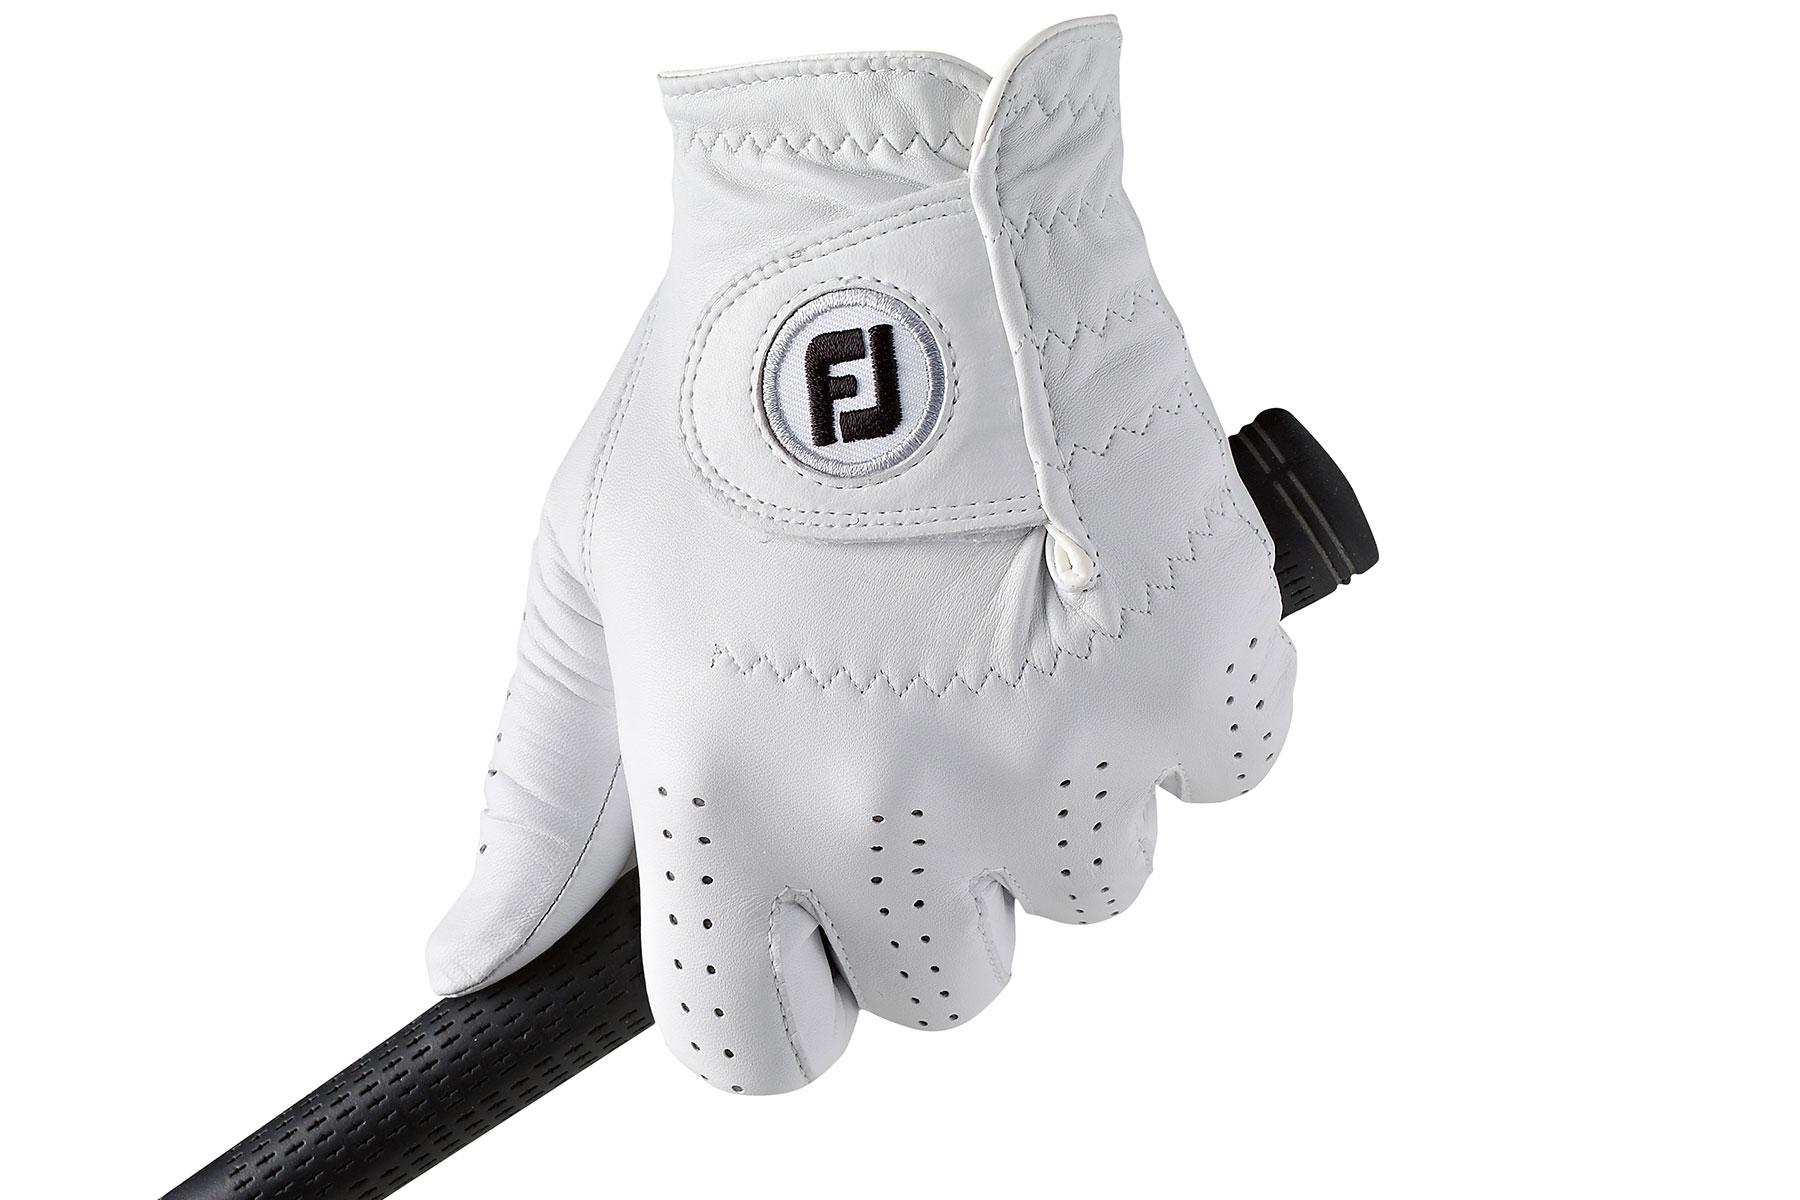 Ladies leather golf gloves uk - Footjoy Cabrettasof Glove